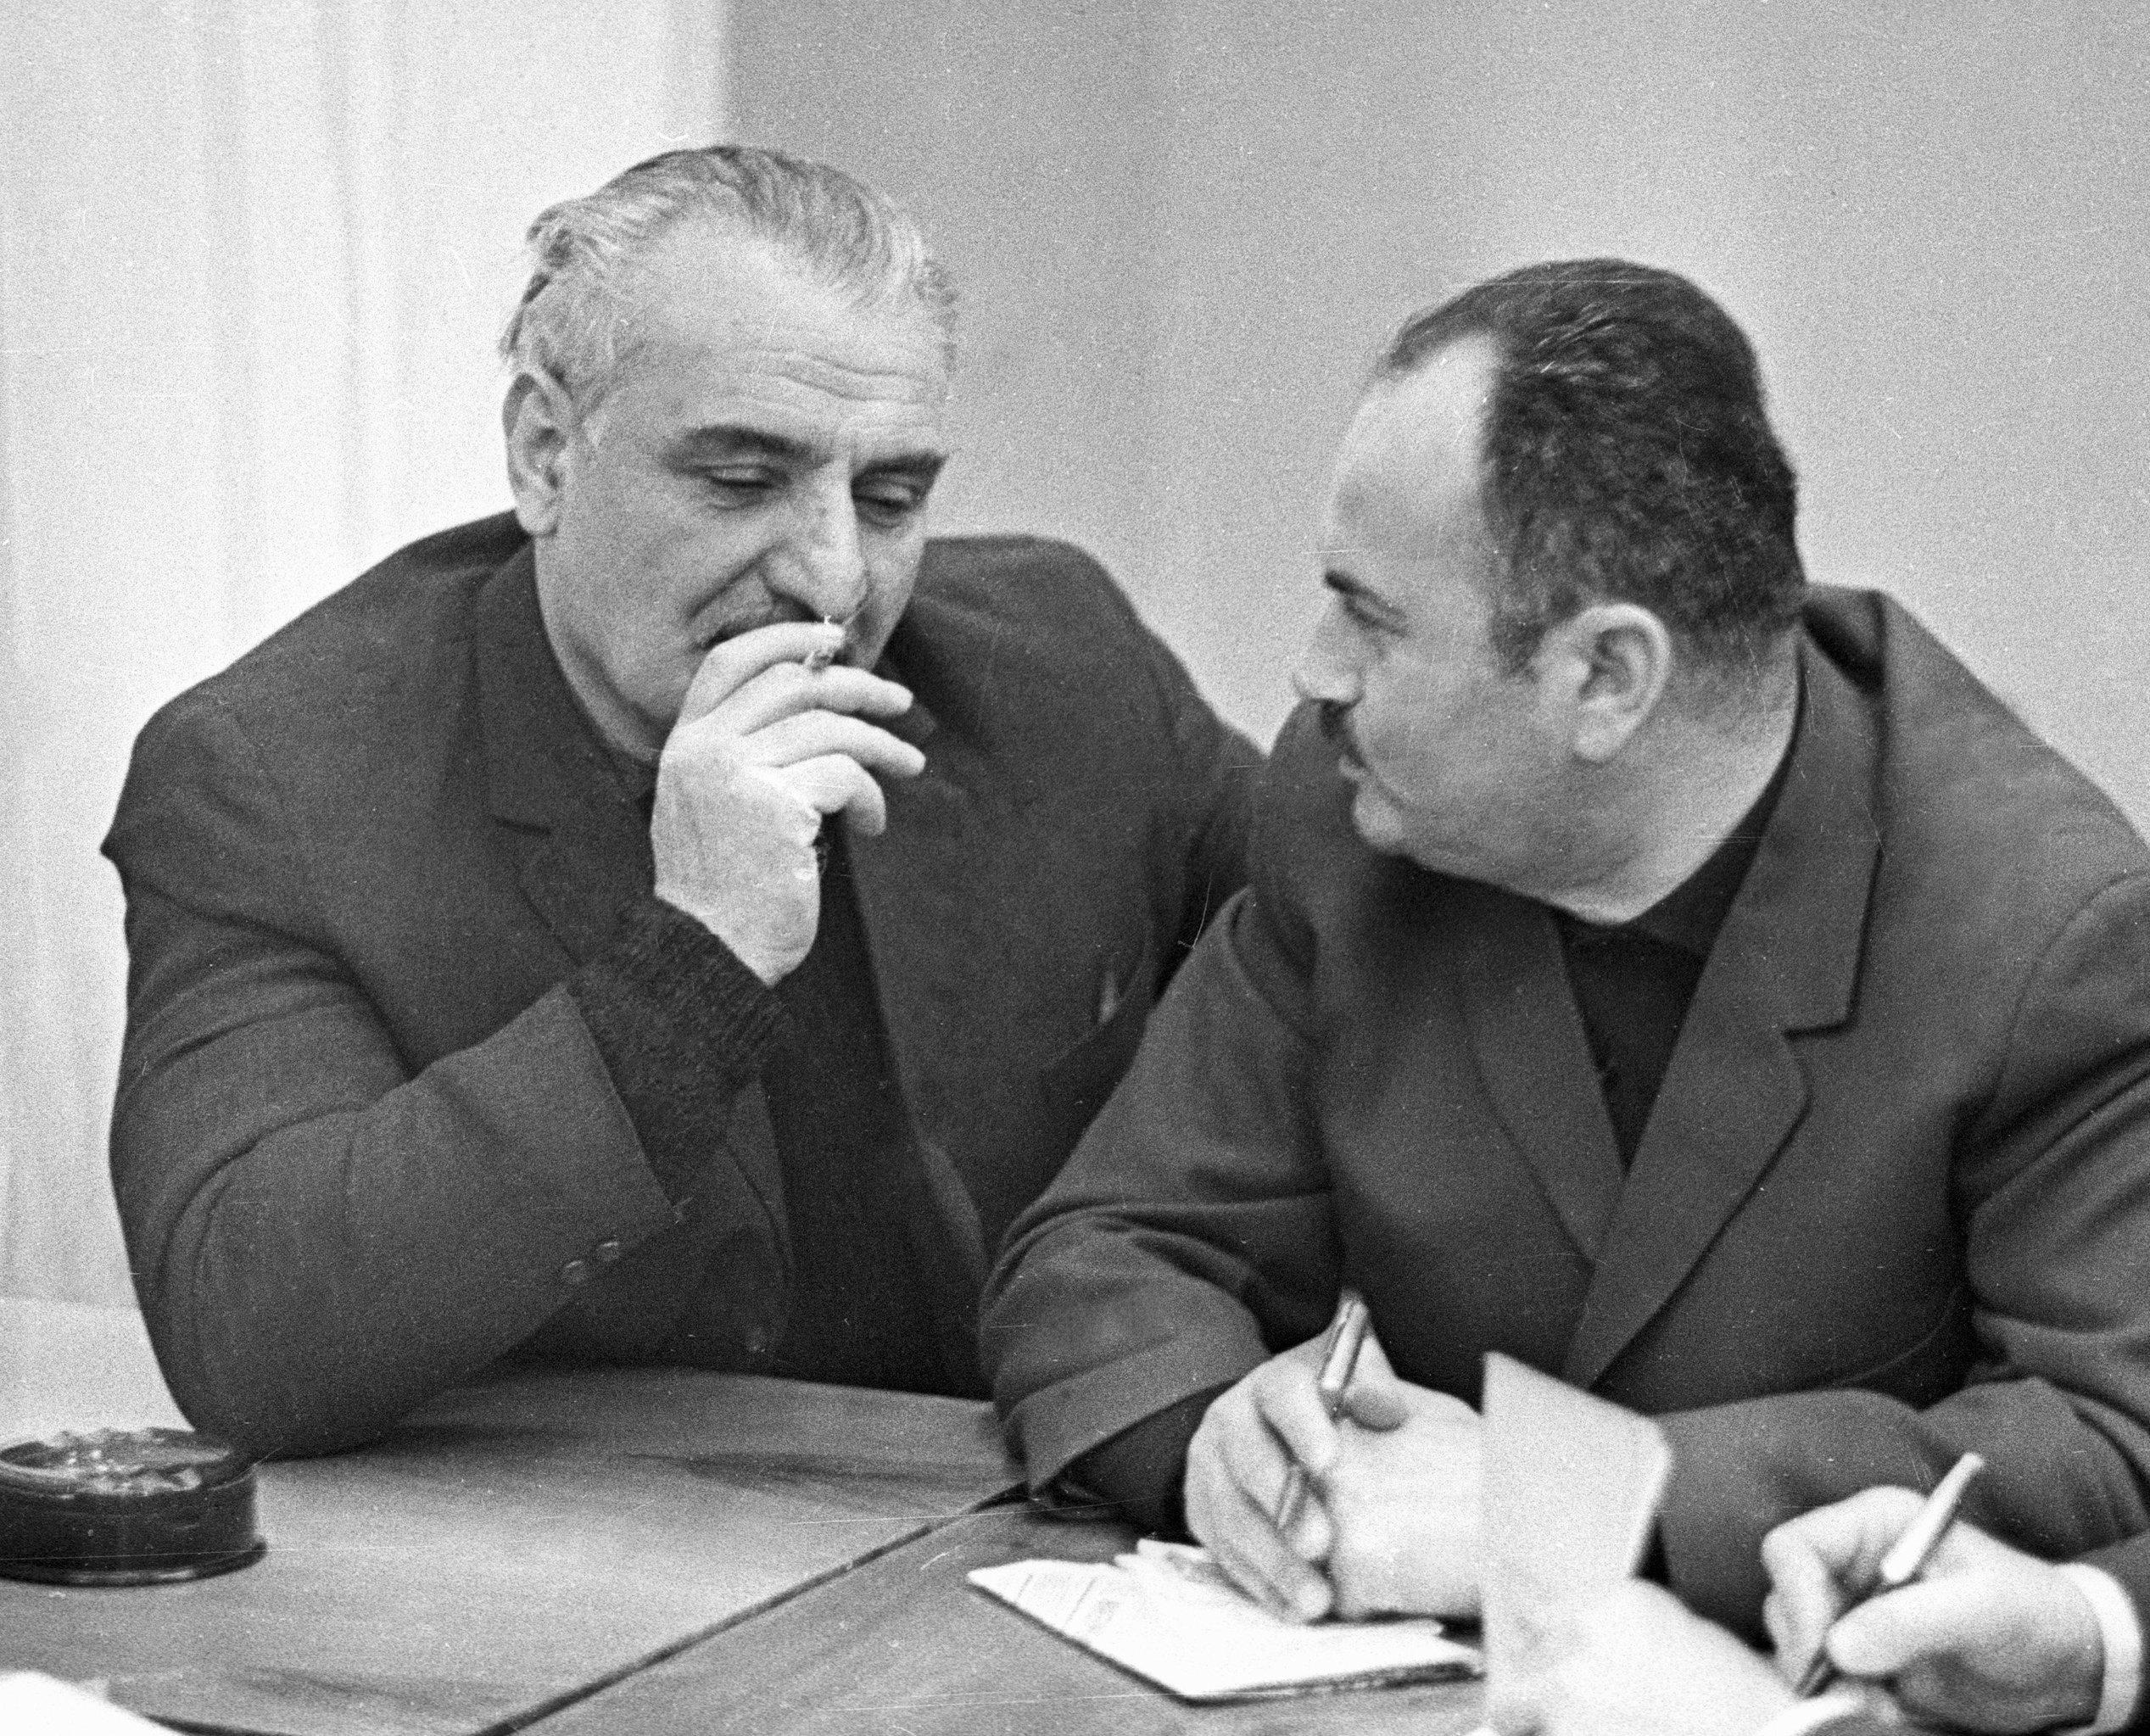 Кинорежиссер Чхеидзе и актер Закариадзе